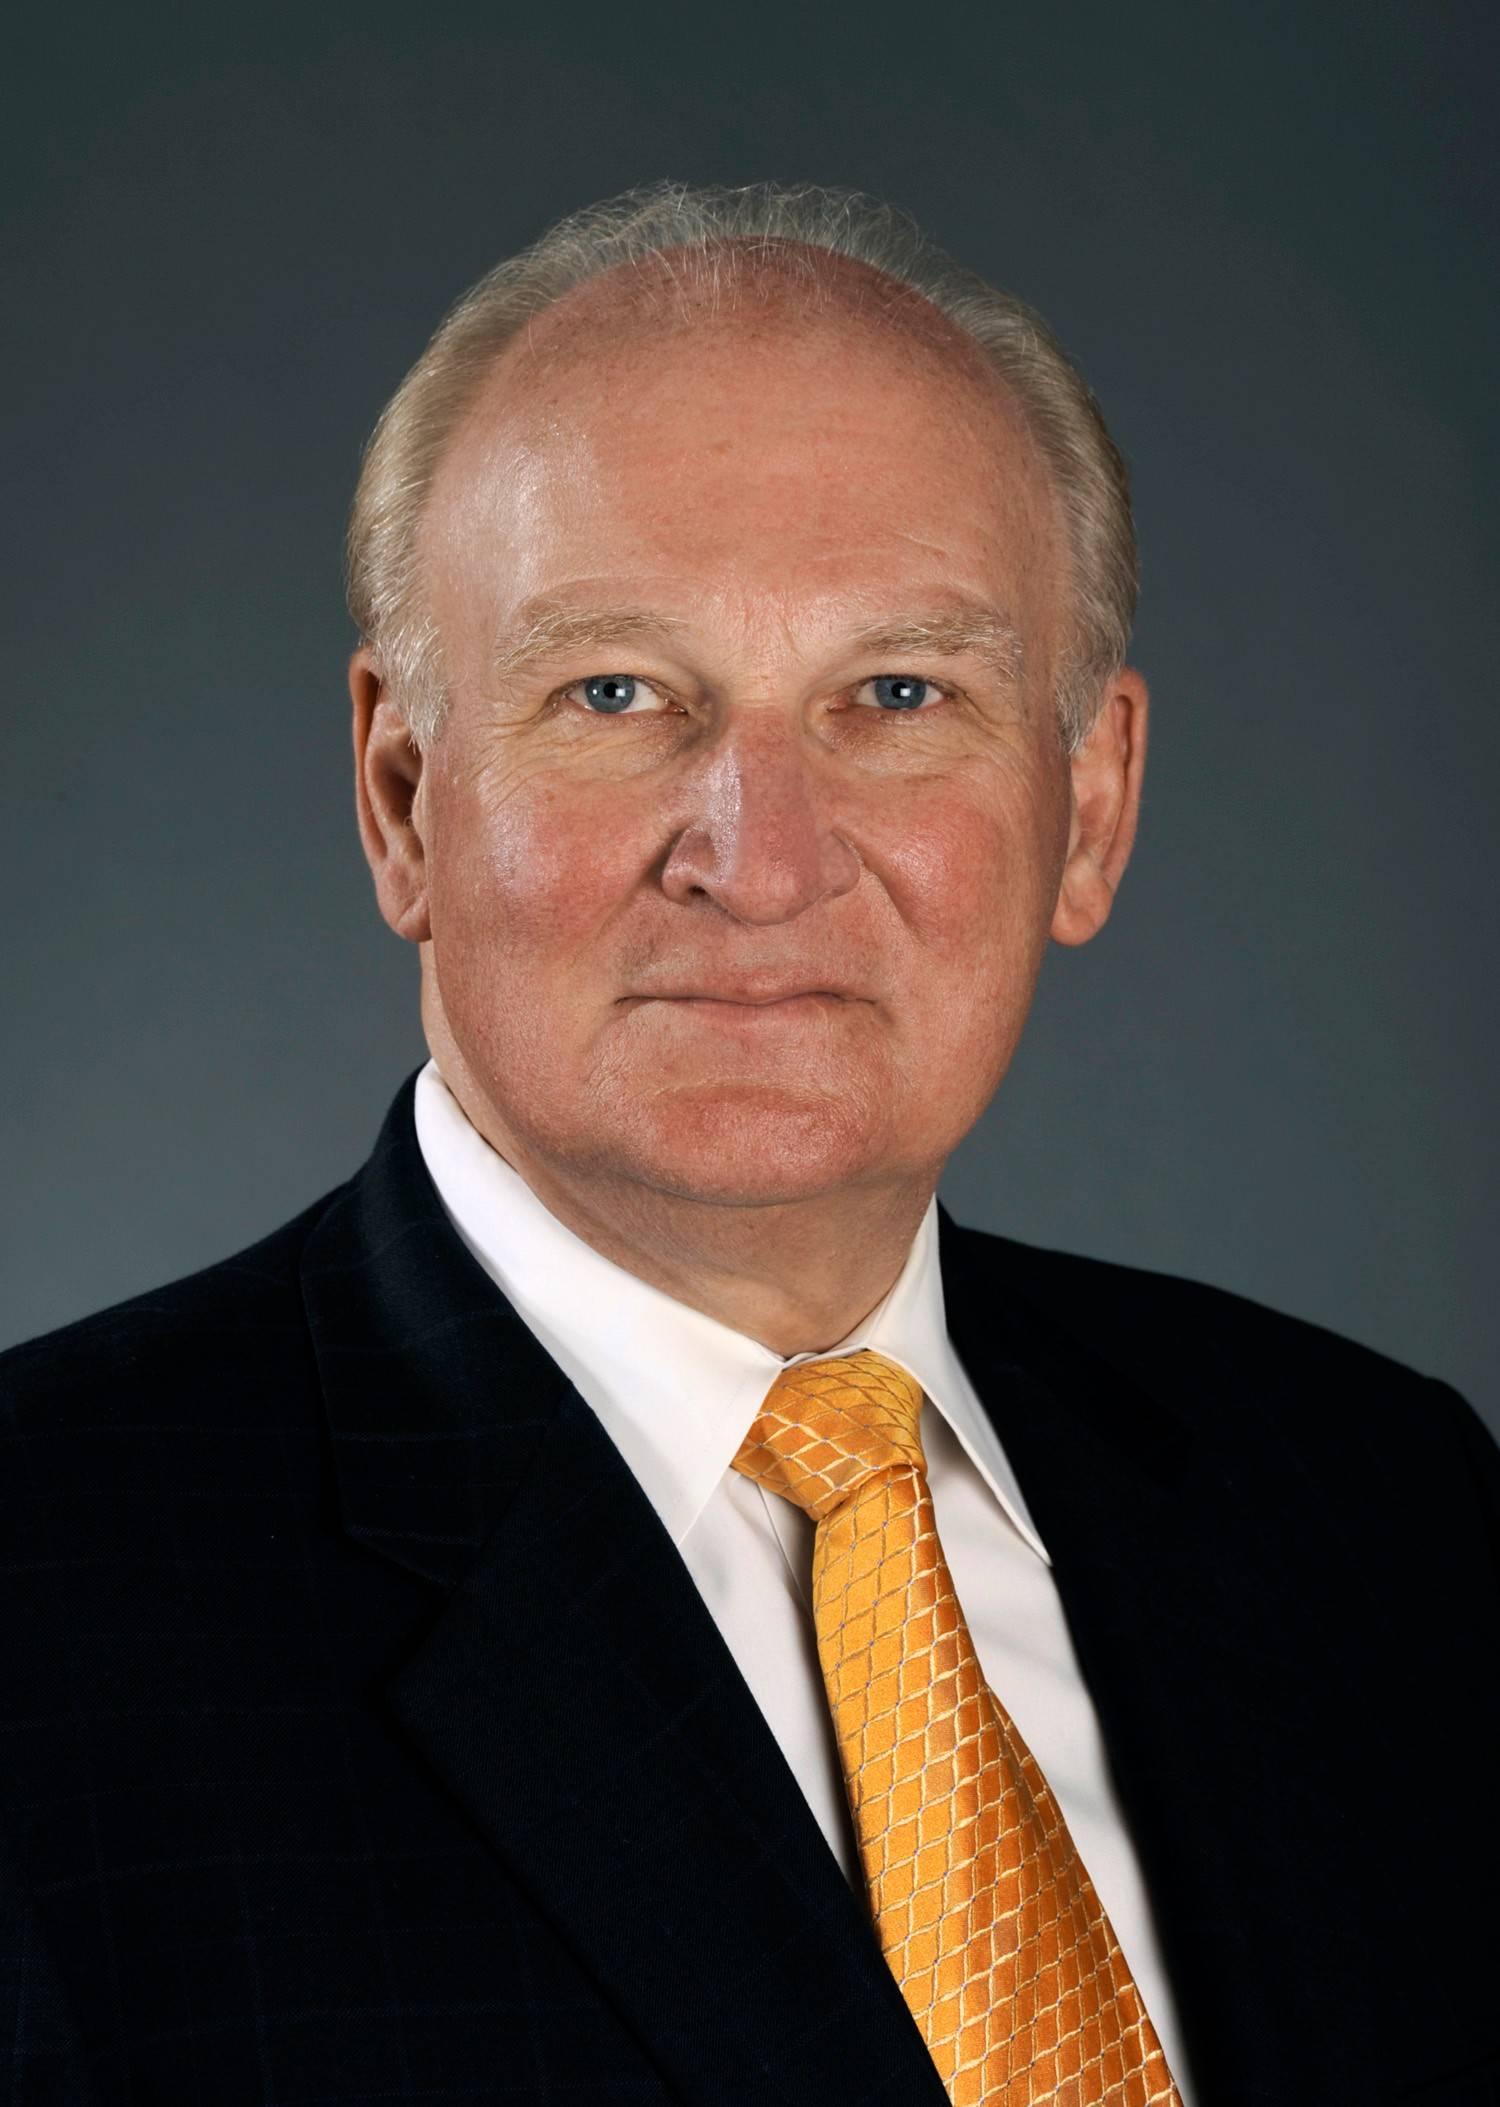 Ex-trustee: Breuder was offered $2 million buyout in 2009